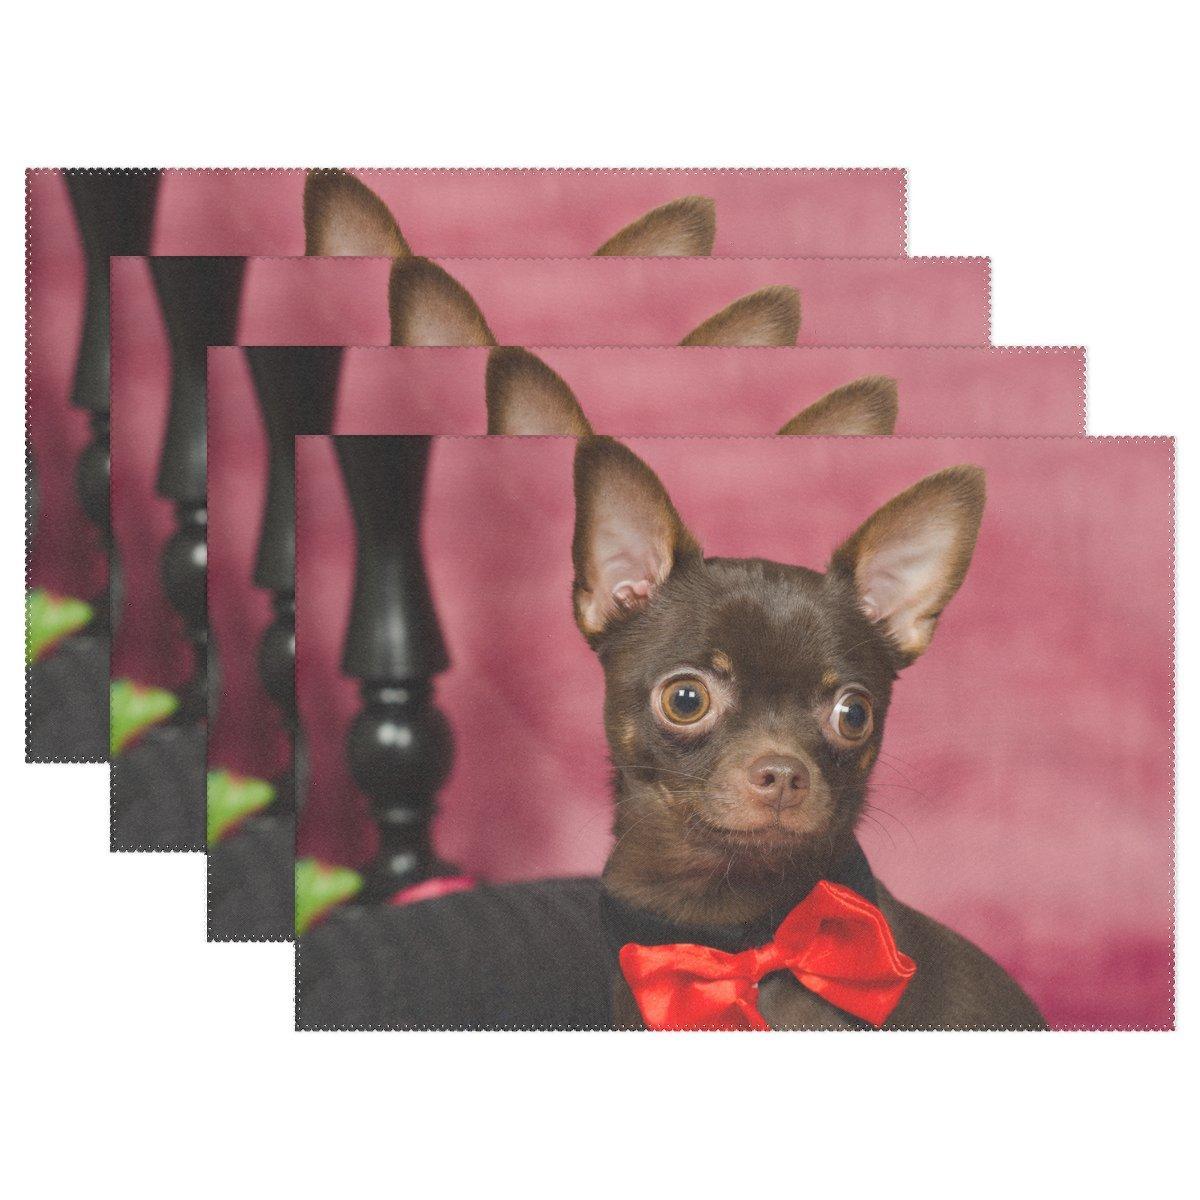 vnaskl動物犬AffenpinscherブラウンSmallふわふわ子犬かわいいペット耐熱テーブルPlacemats Set of 4 Stain Resistantテーブルマット洗濯可能食べマットホームディナー装飾   B07D8J959D